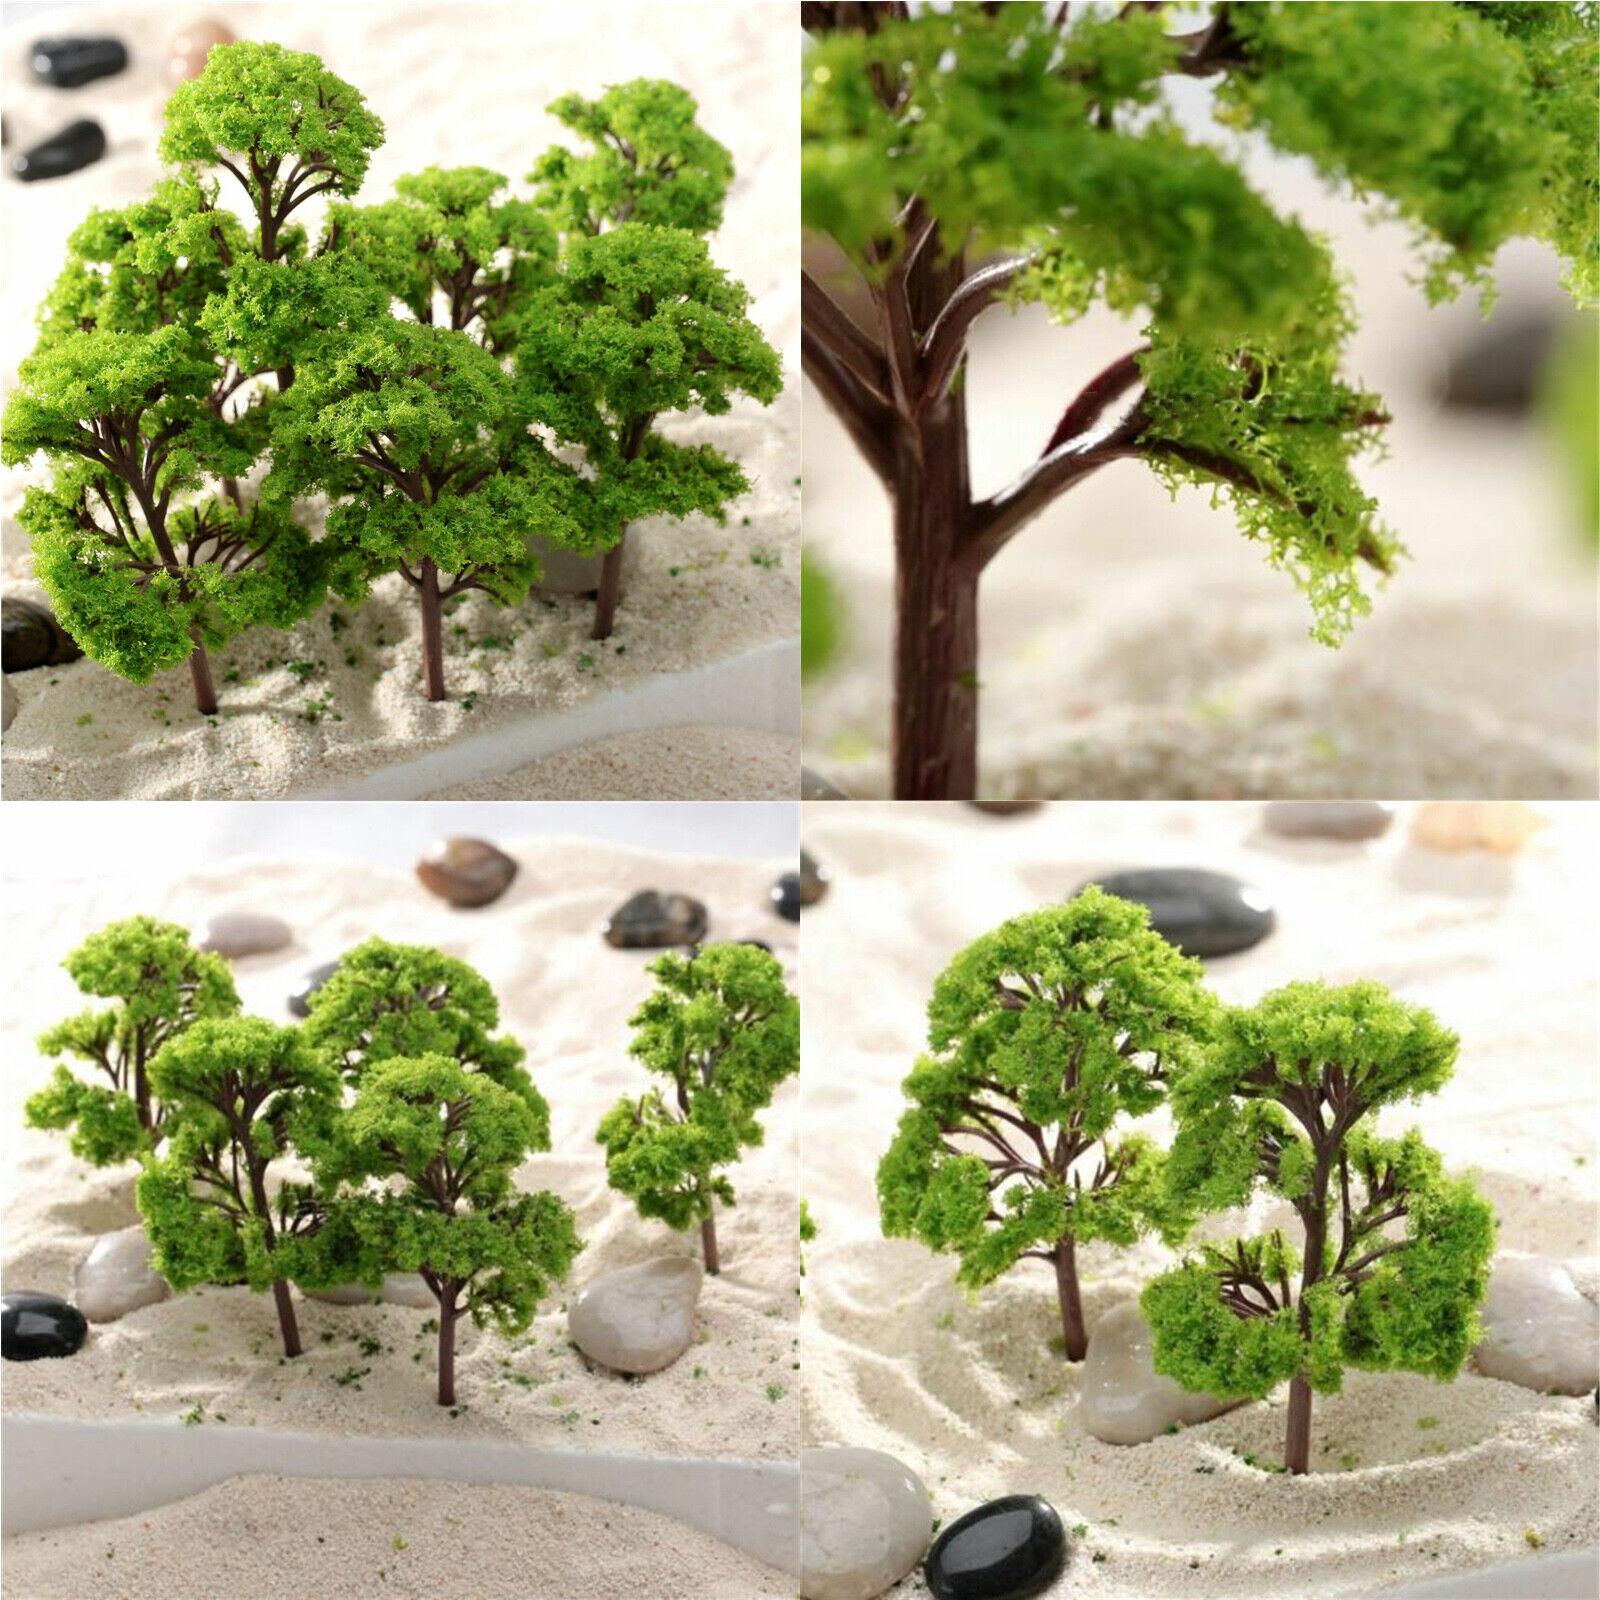 Coconut Palm Trees Model Layout Train Darden Scenery Decor HO OO Scale 15pcs